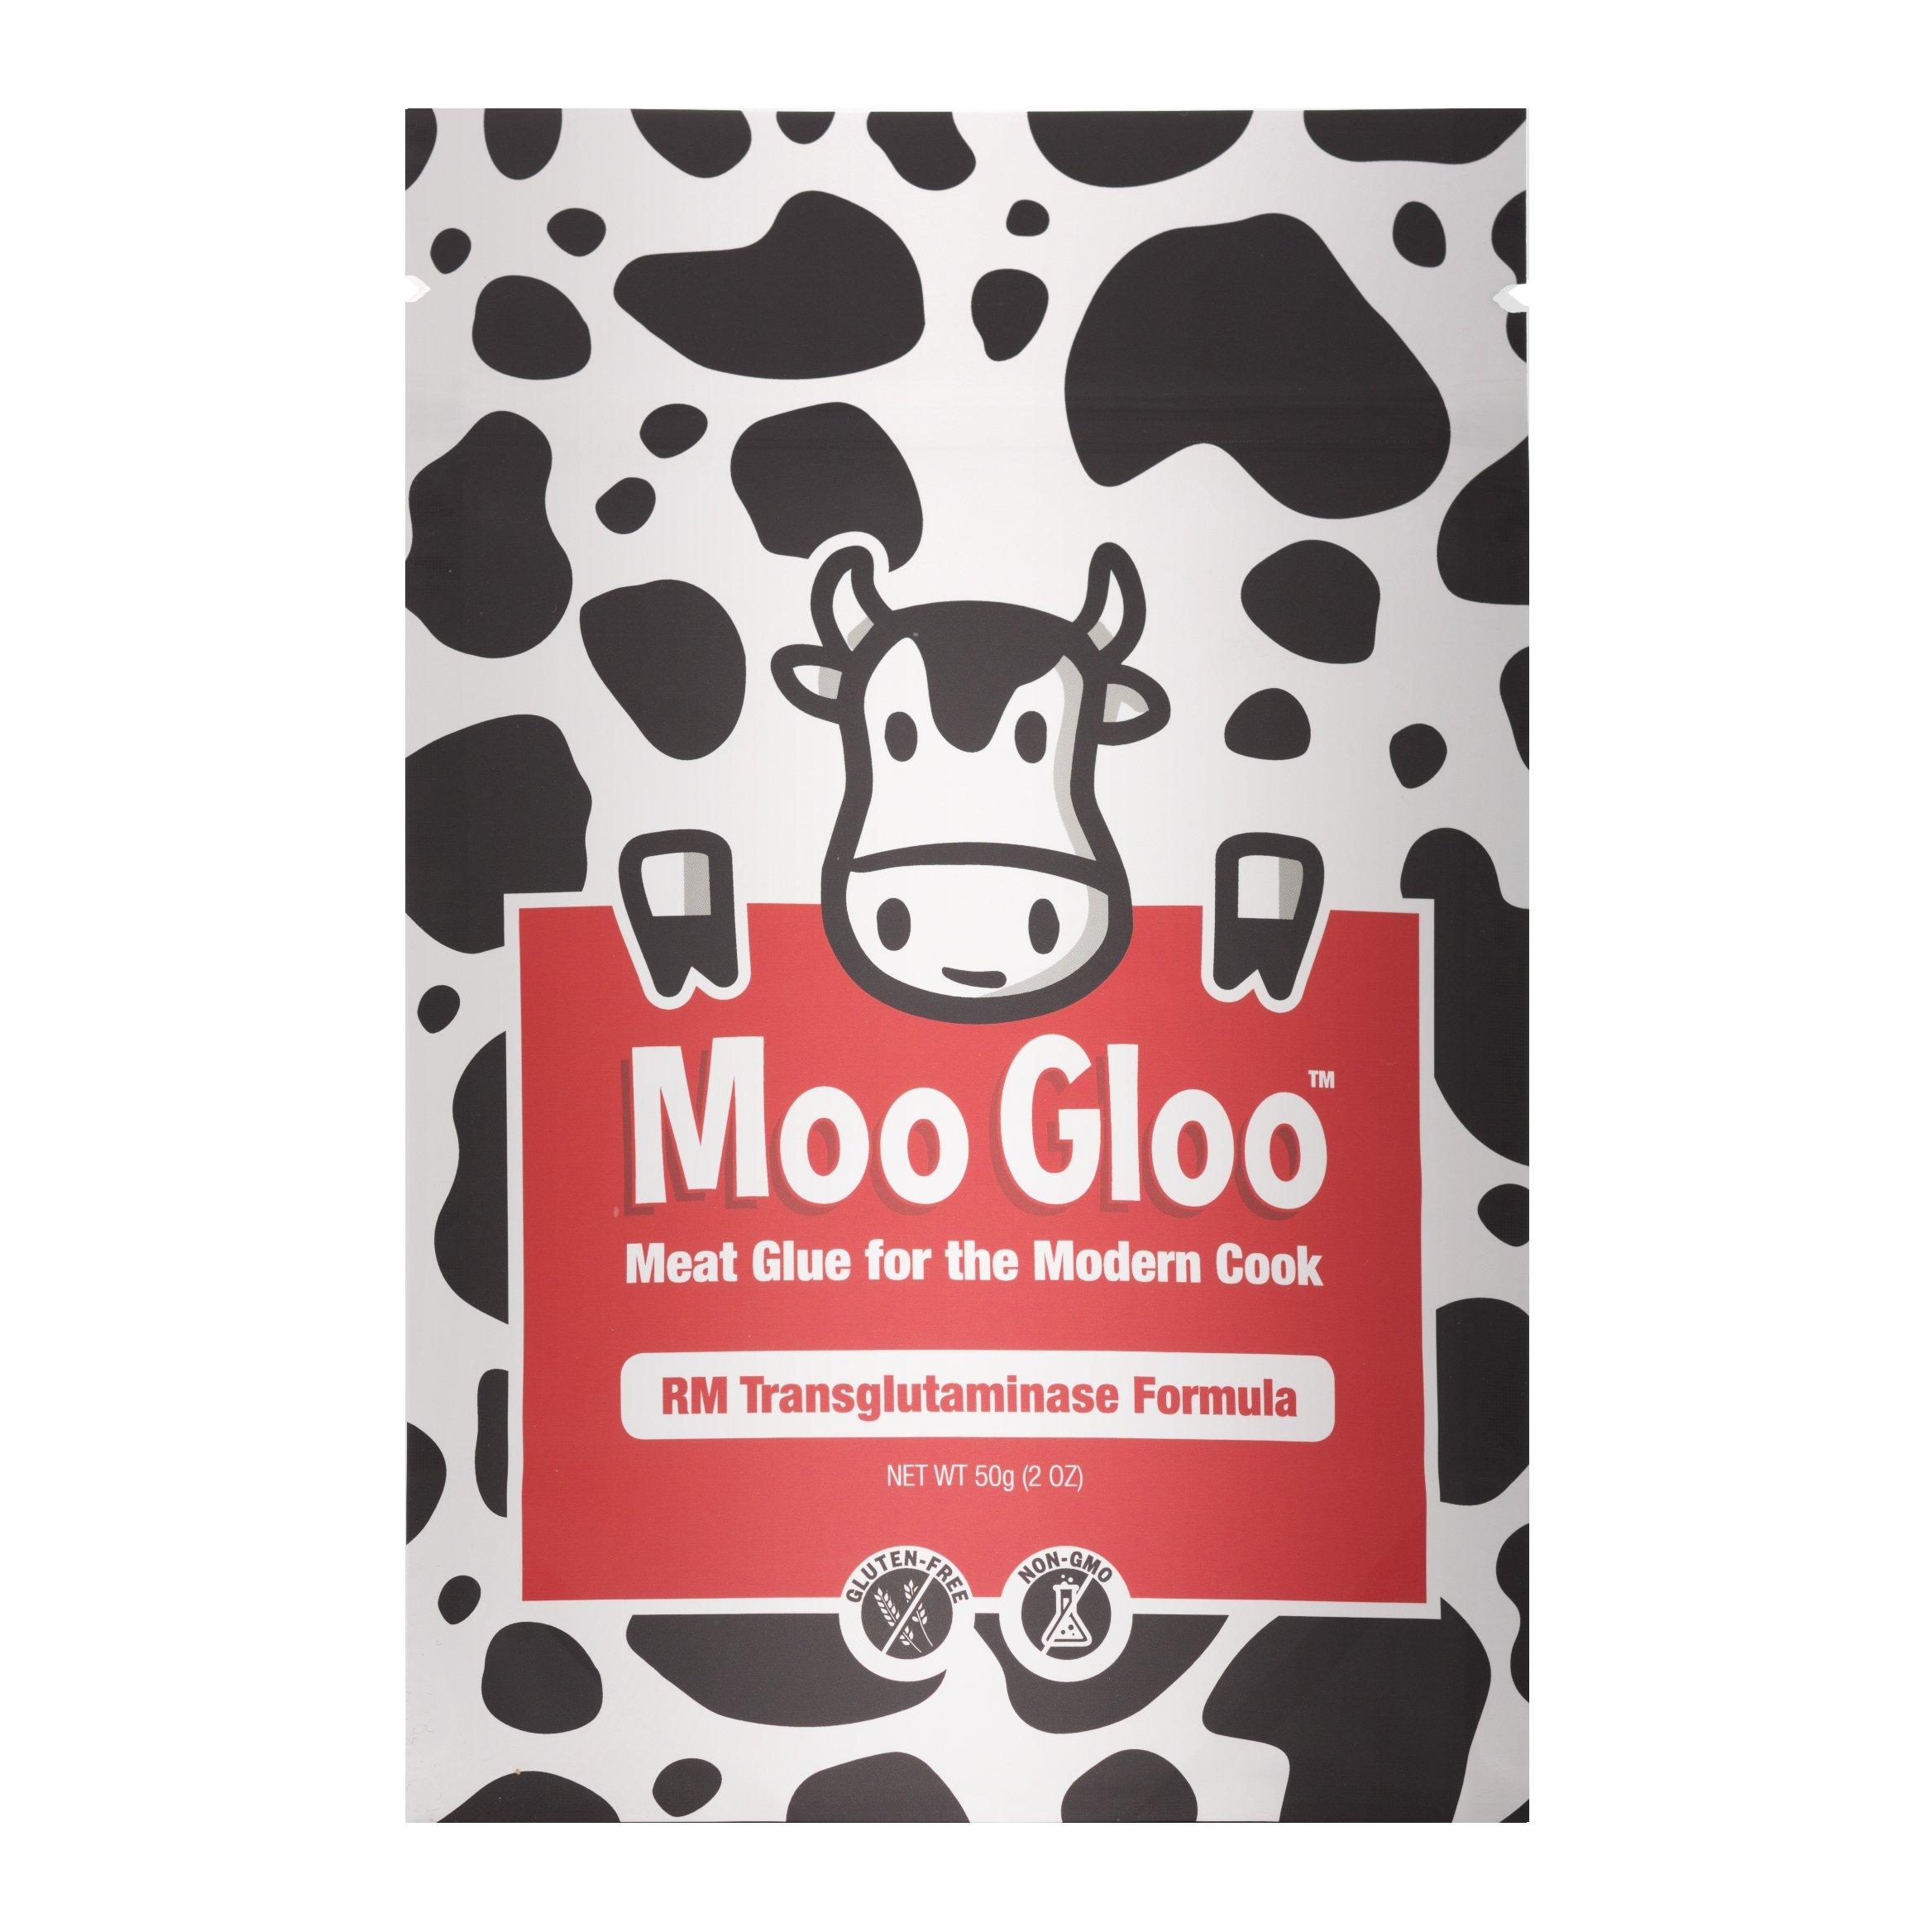 Transglutaminase (Meat Glue) - RM Formula - 50g/2oz by Moo Gloo